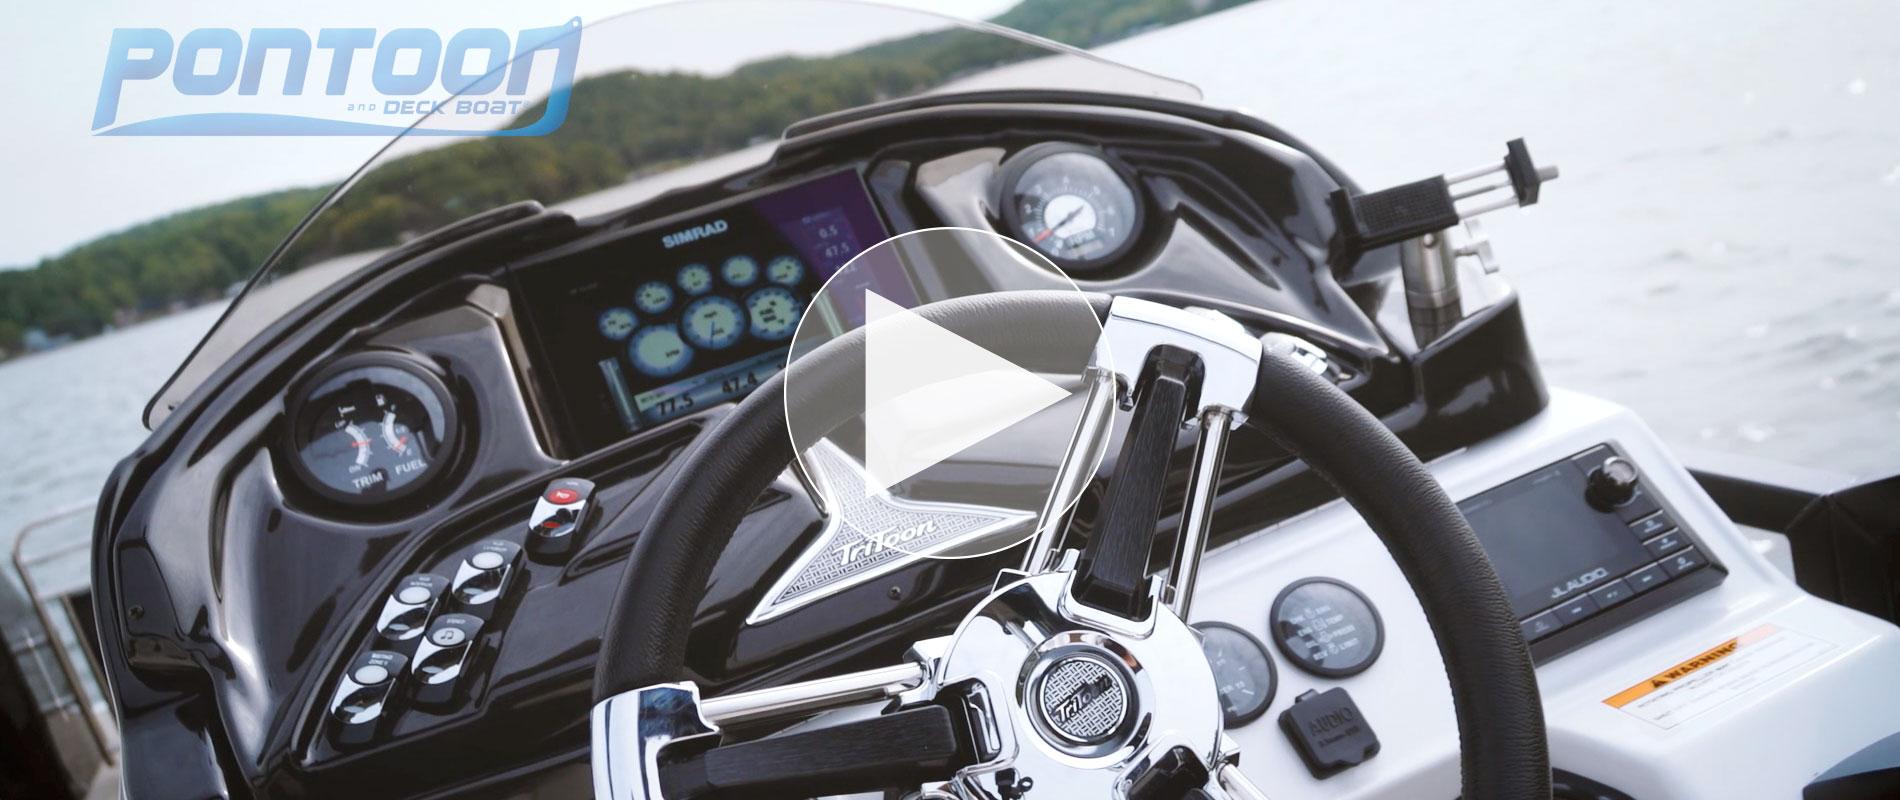 Sporttoon Pontoon Boats Jc Tritoon Marine Standard Boat Wiring Diagram Bass Magazine View Video Of The Deck 2018 Shootout Featuring 26tt Rfl